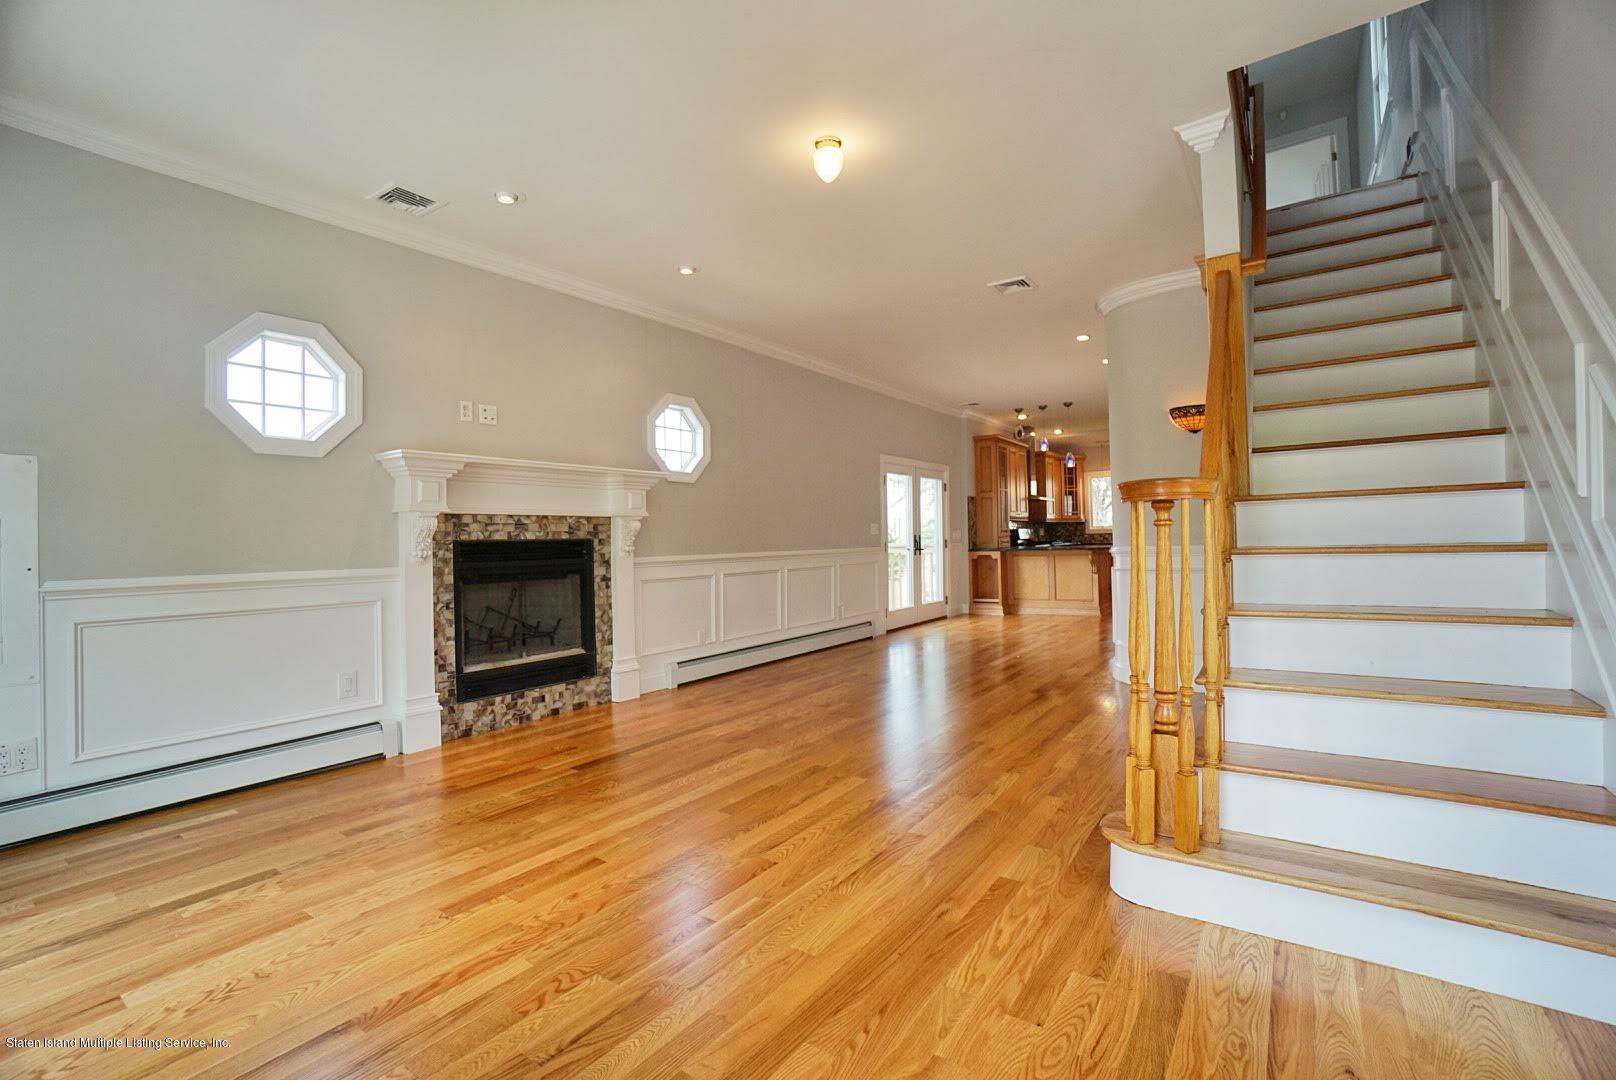 Single Family - Detached 445 Manhattan Street  Staten Island, NY 10307, MLS-1130505-4